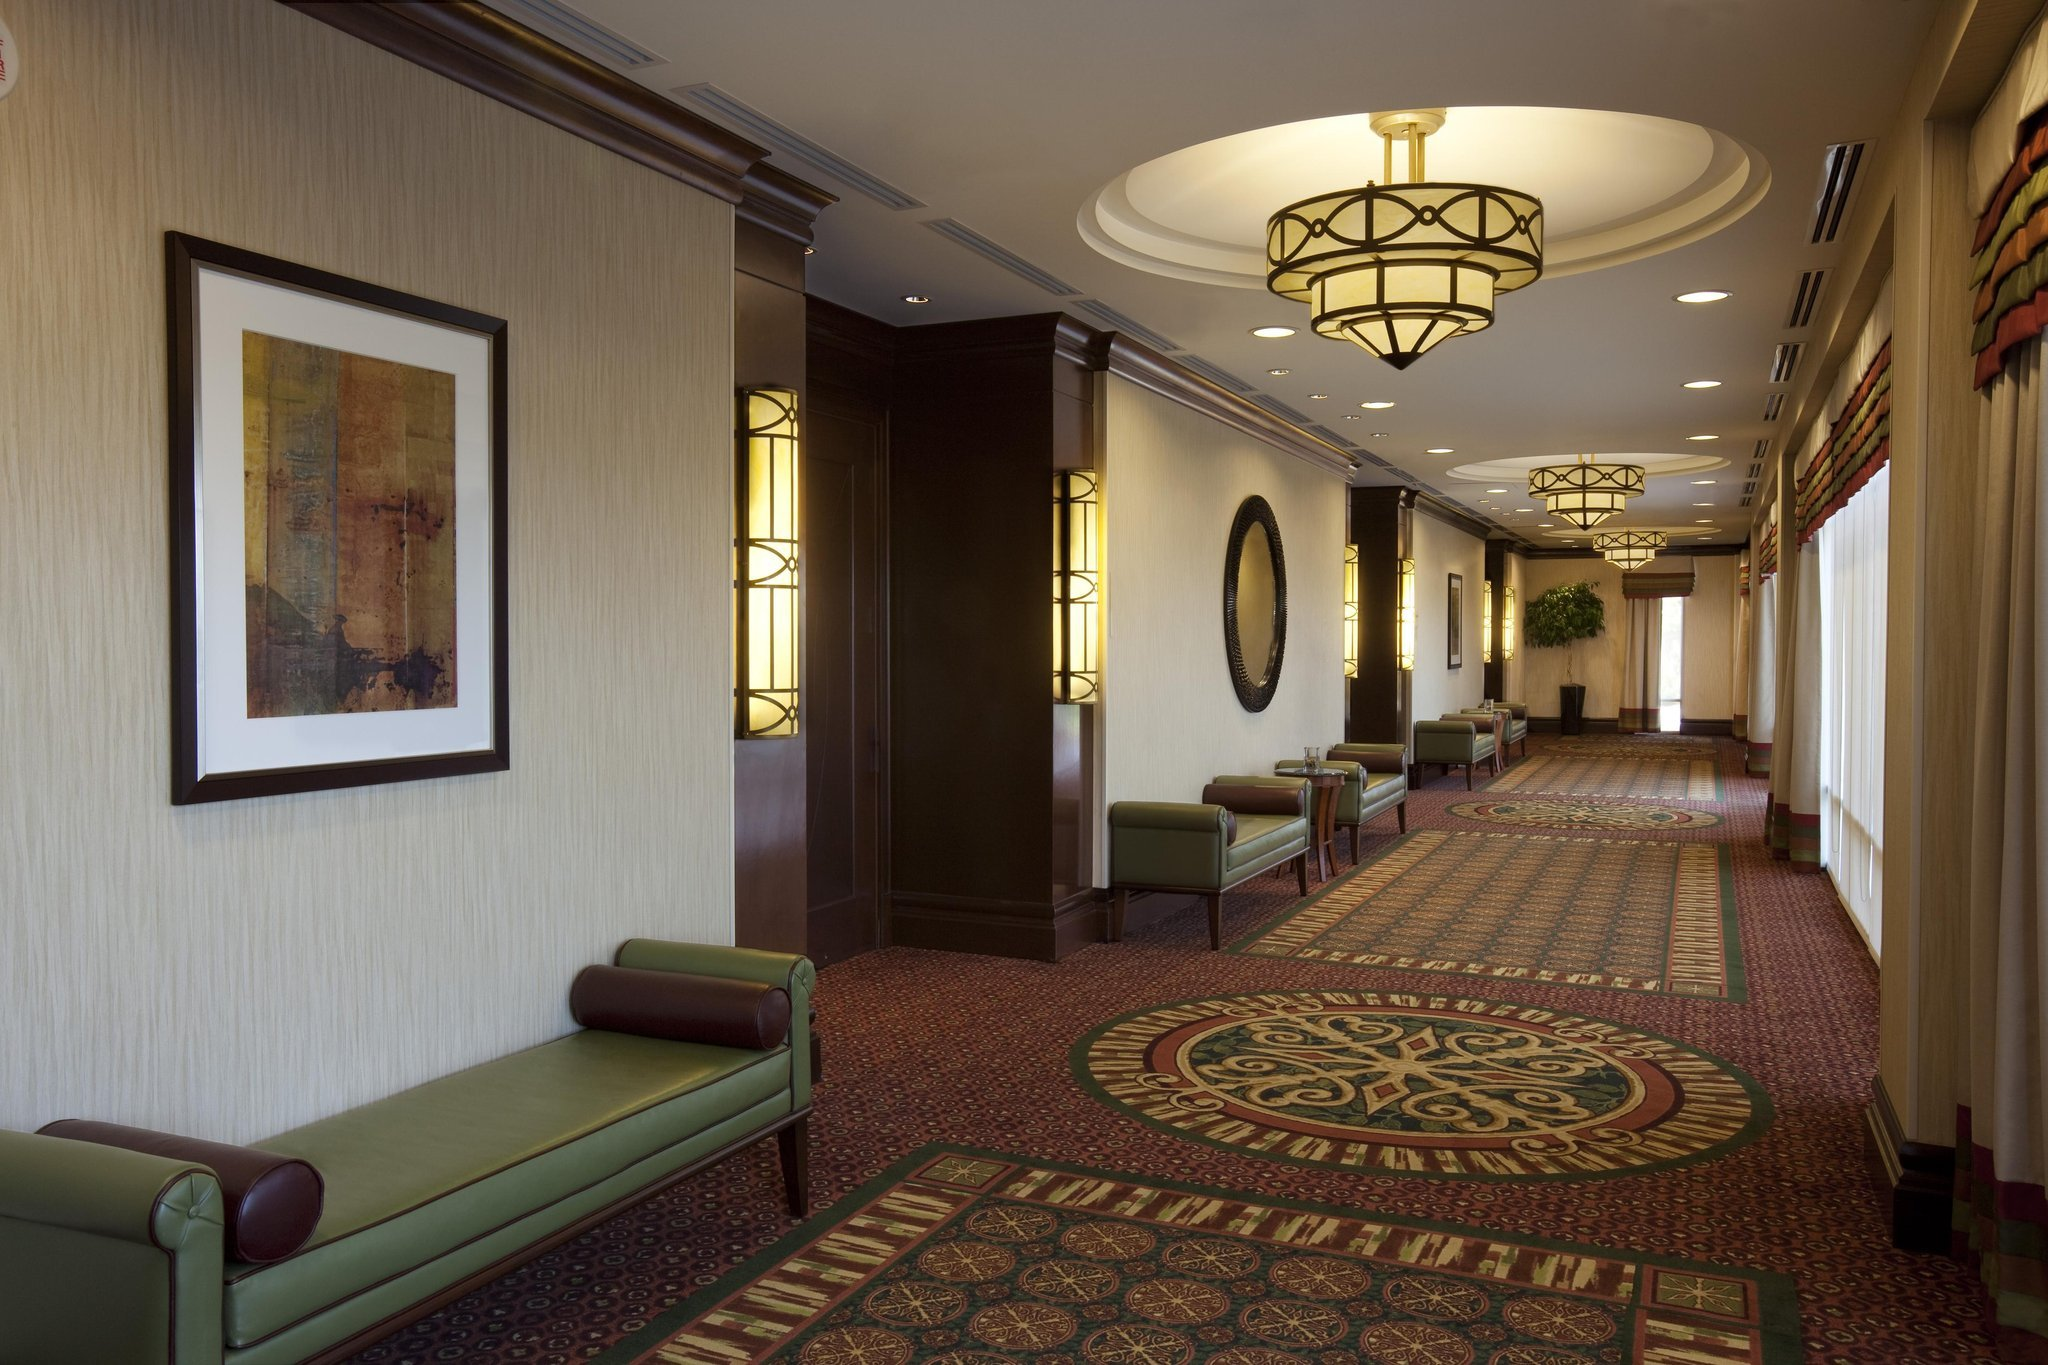 Hilton Garden Inn Kitchener Hilton Garden Inn Toronto Airport Updated 2017 Hotel Reviews